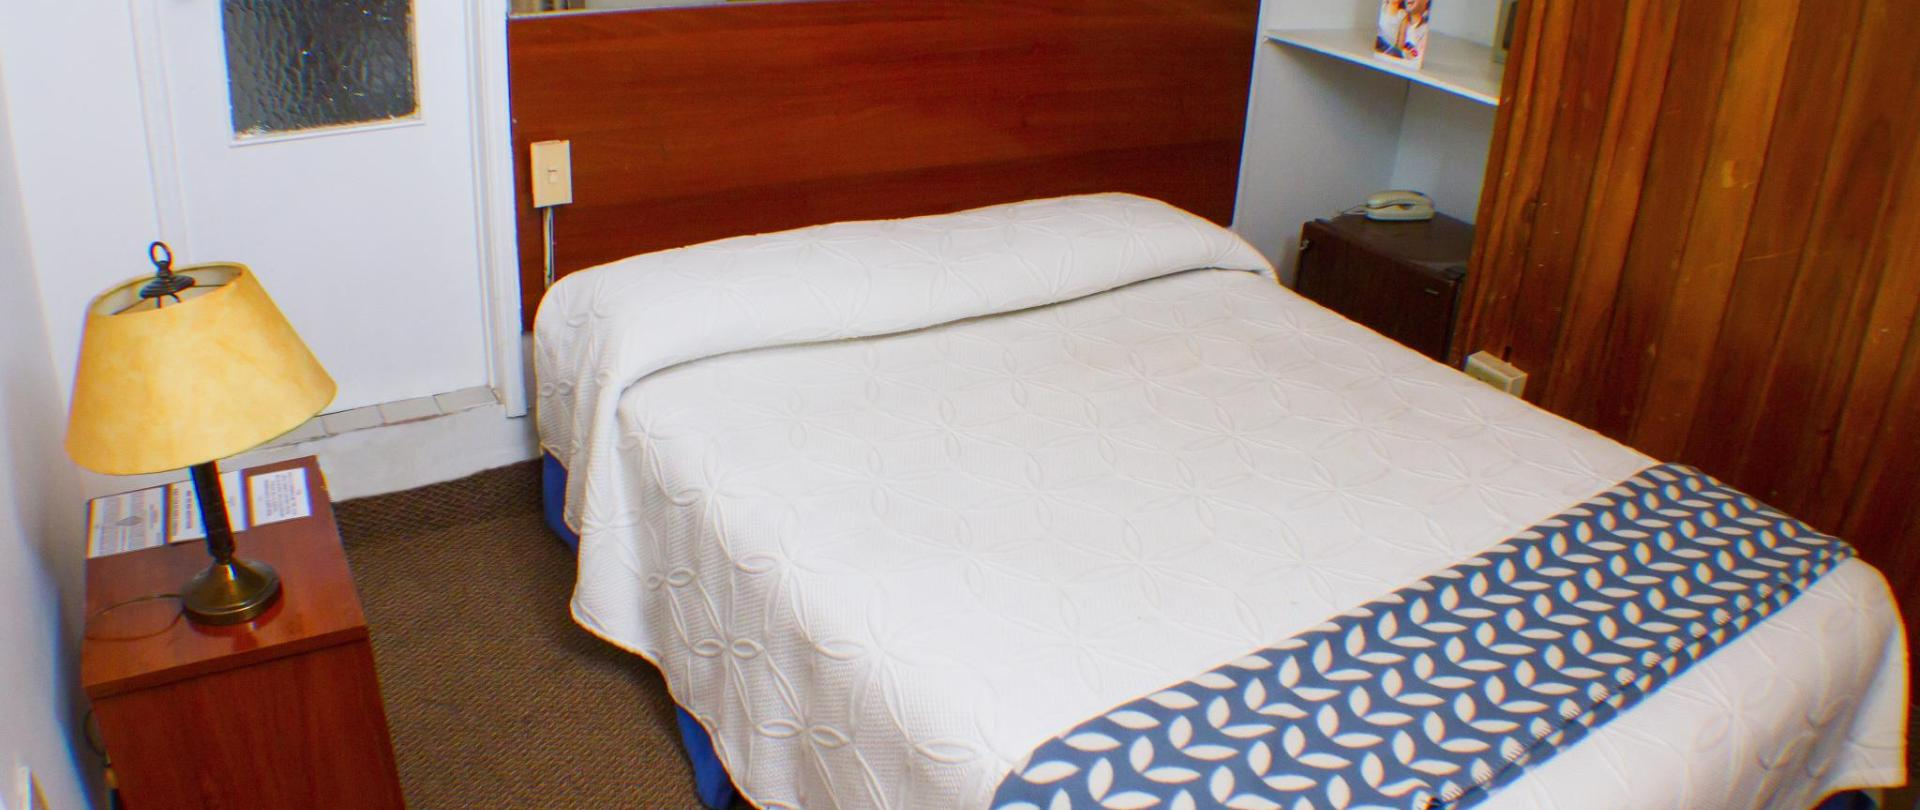 Hotel_Siar-8116.jpg